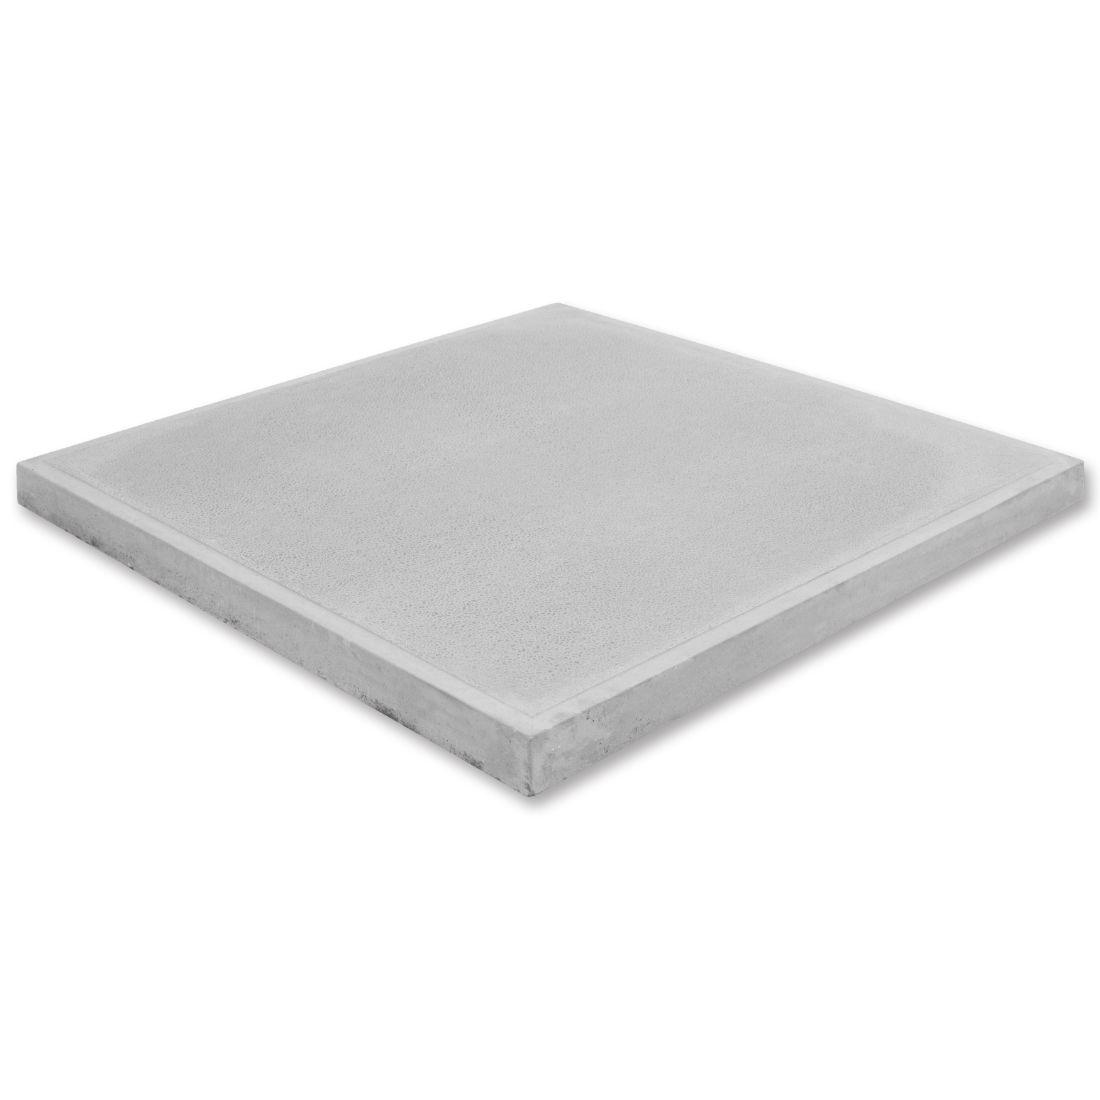 Viltorio Concrete Paver 600 x 600 x 37mm Natural Stone